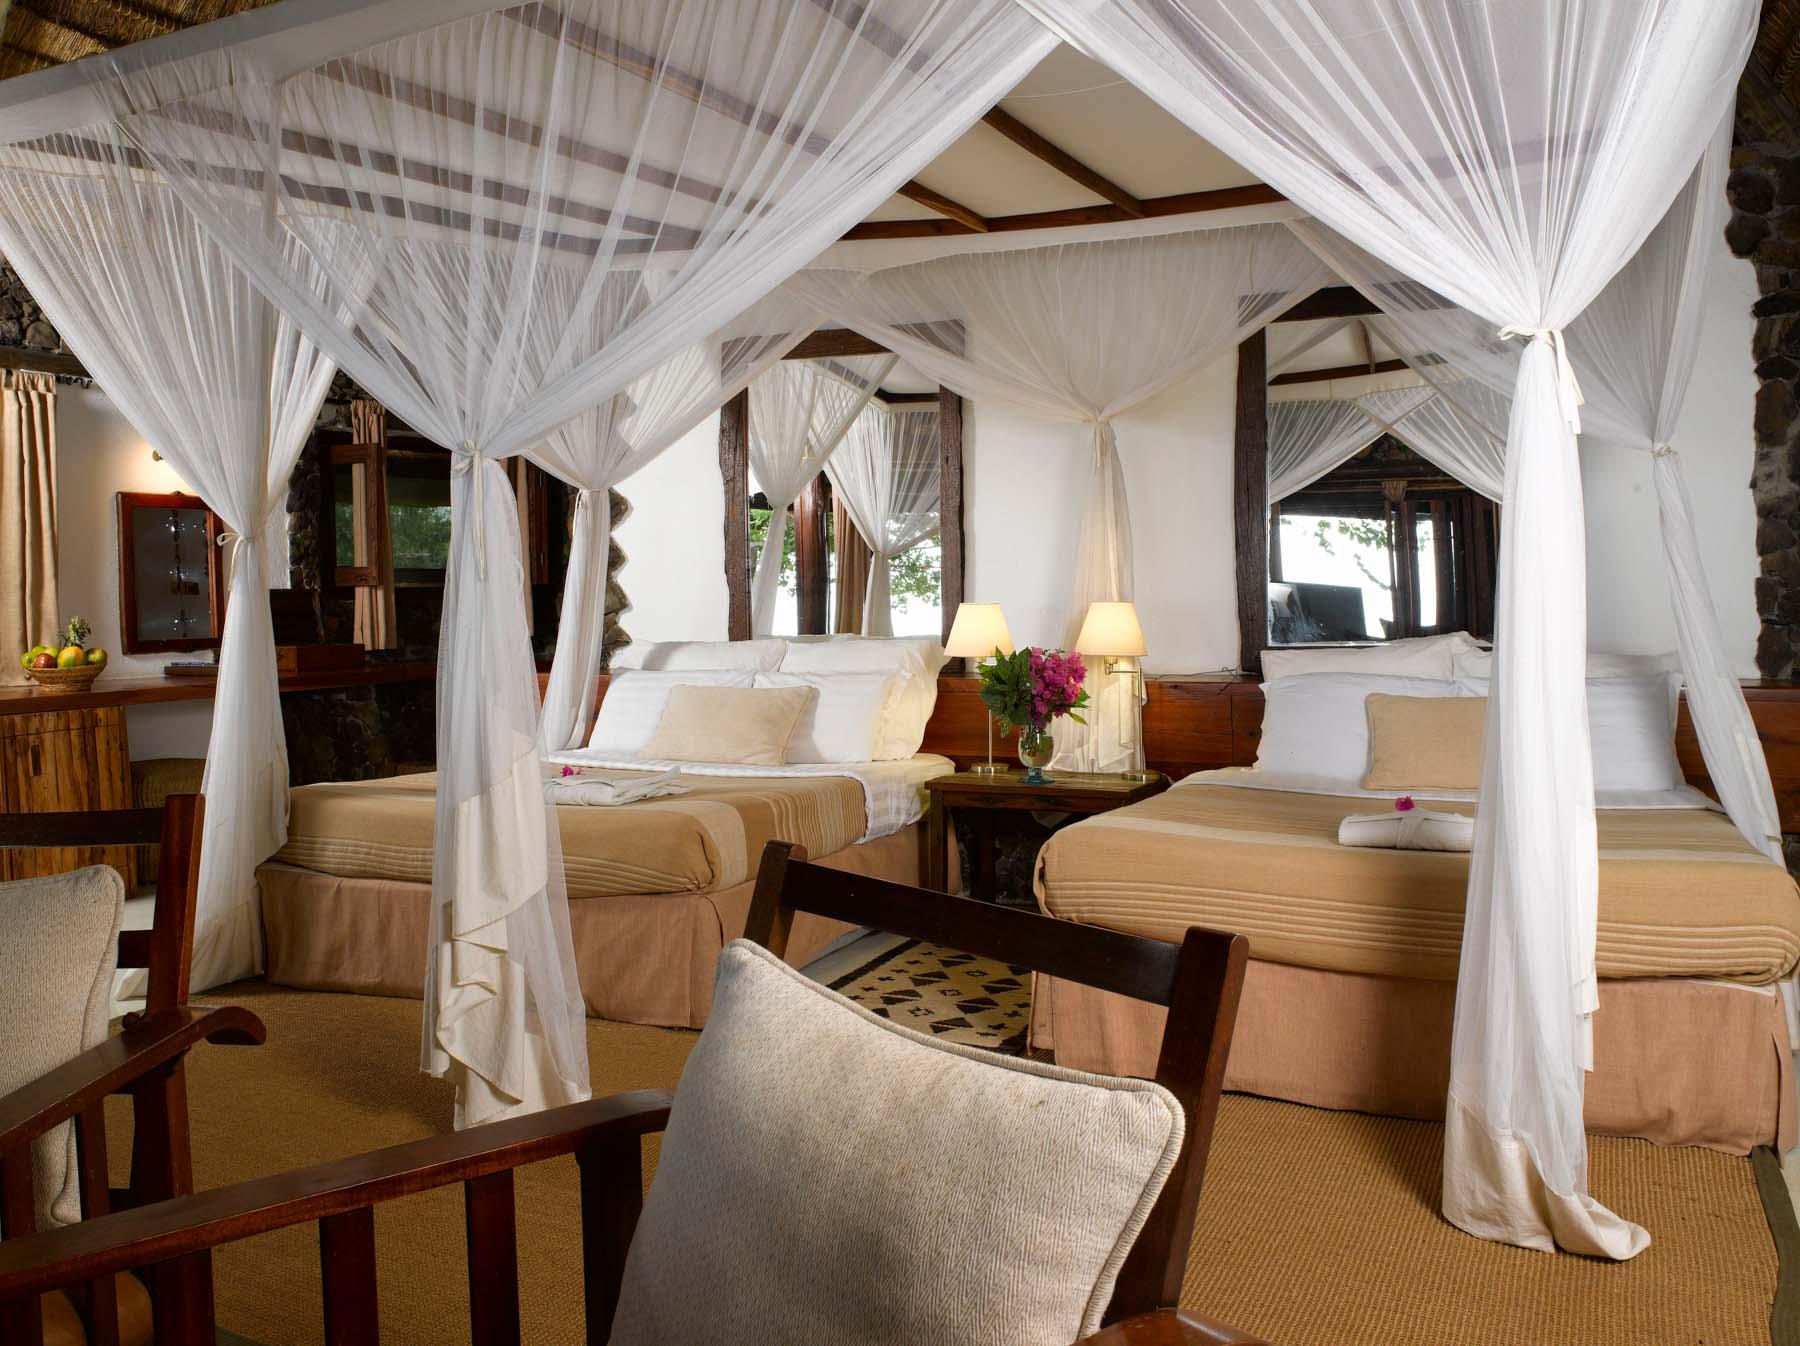 rusinga-island-lodge-kenya-guest_bedroom_1.jpg